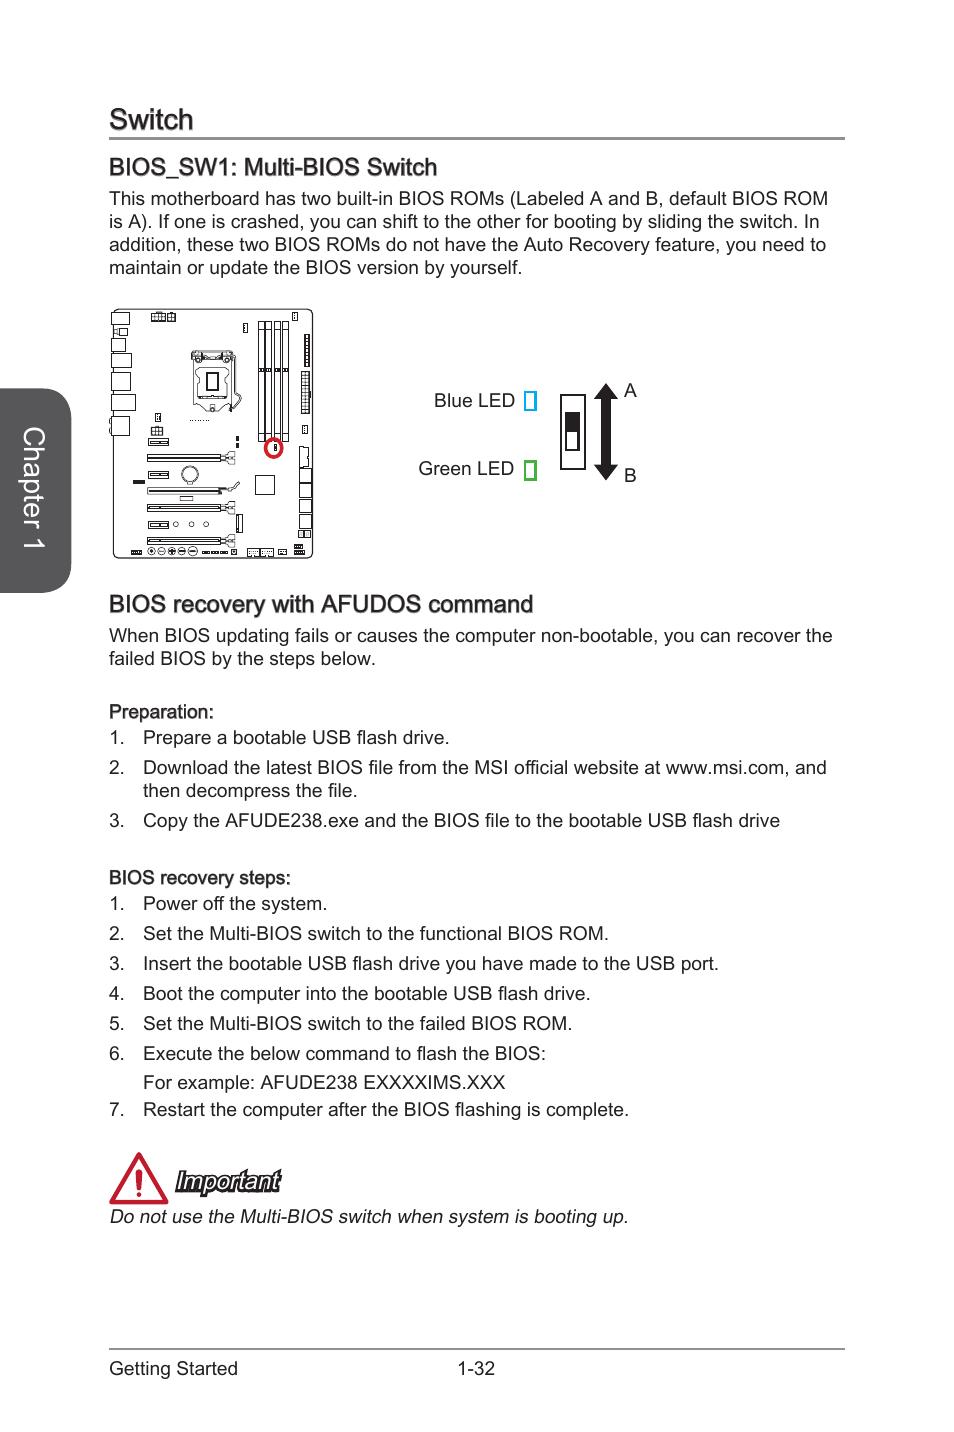 jumpers 32 bios sw1 multi bios switch msi z97 mpower manual rh manualsdir com manually uninstall bios gigabyte bios manual